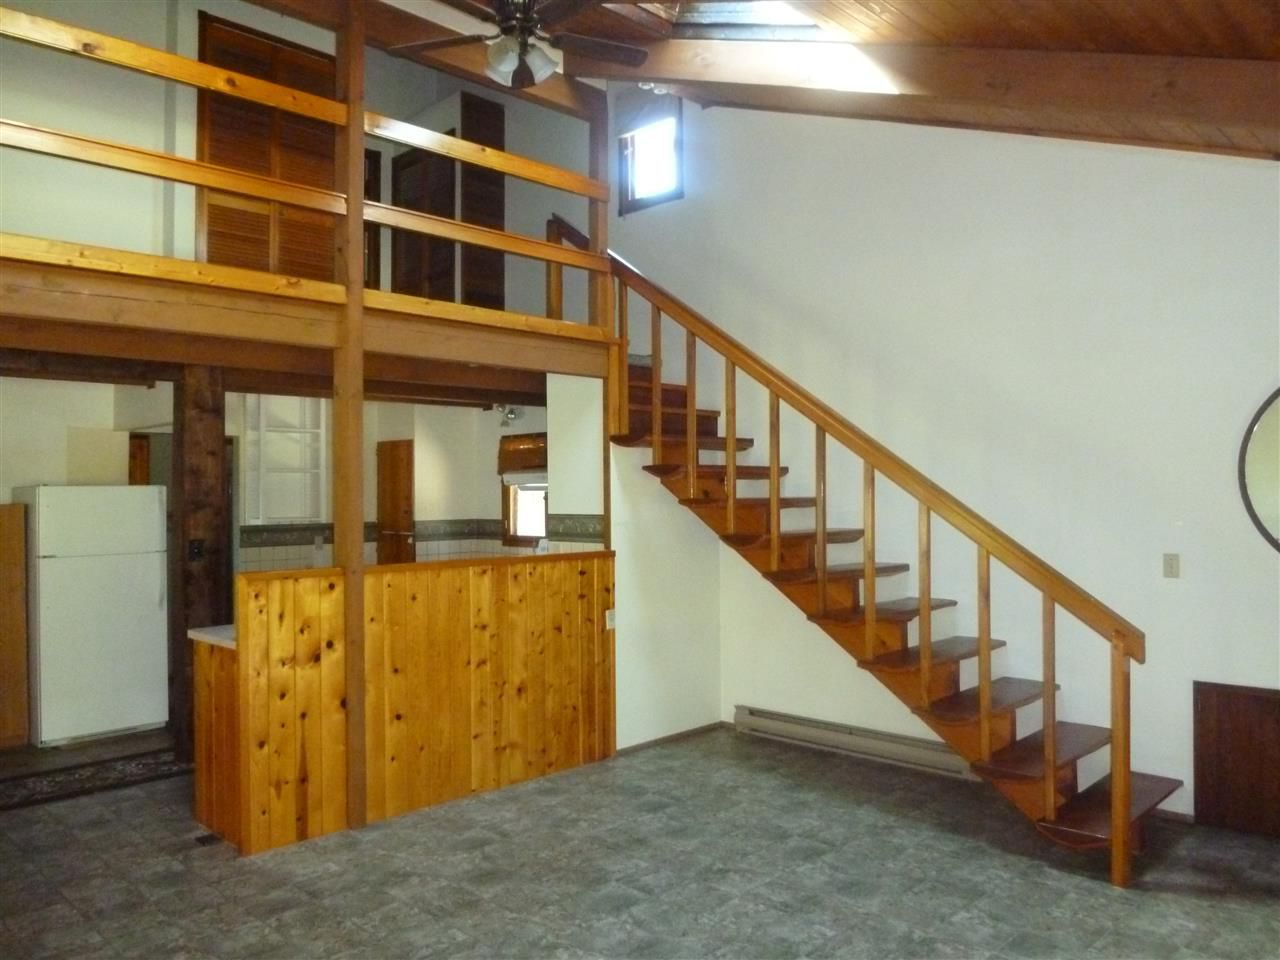 "Photo 5: Photos: 5665 SURF Circle in Sechelt: Sechelt District House for sale in ""SECHELT"" (Sunshine Coast)  : MLS®# R2101936"